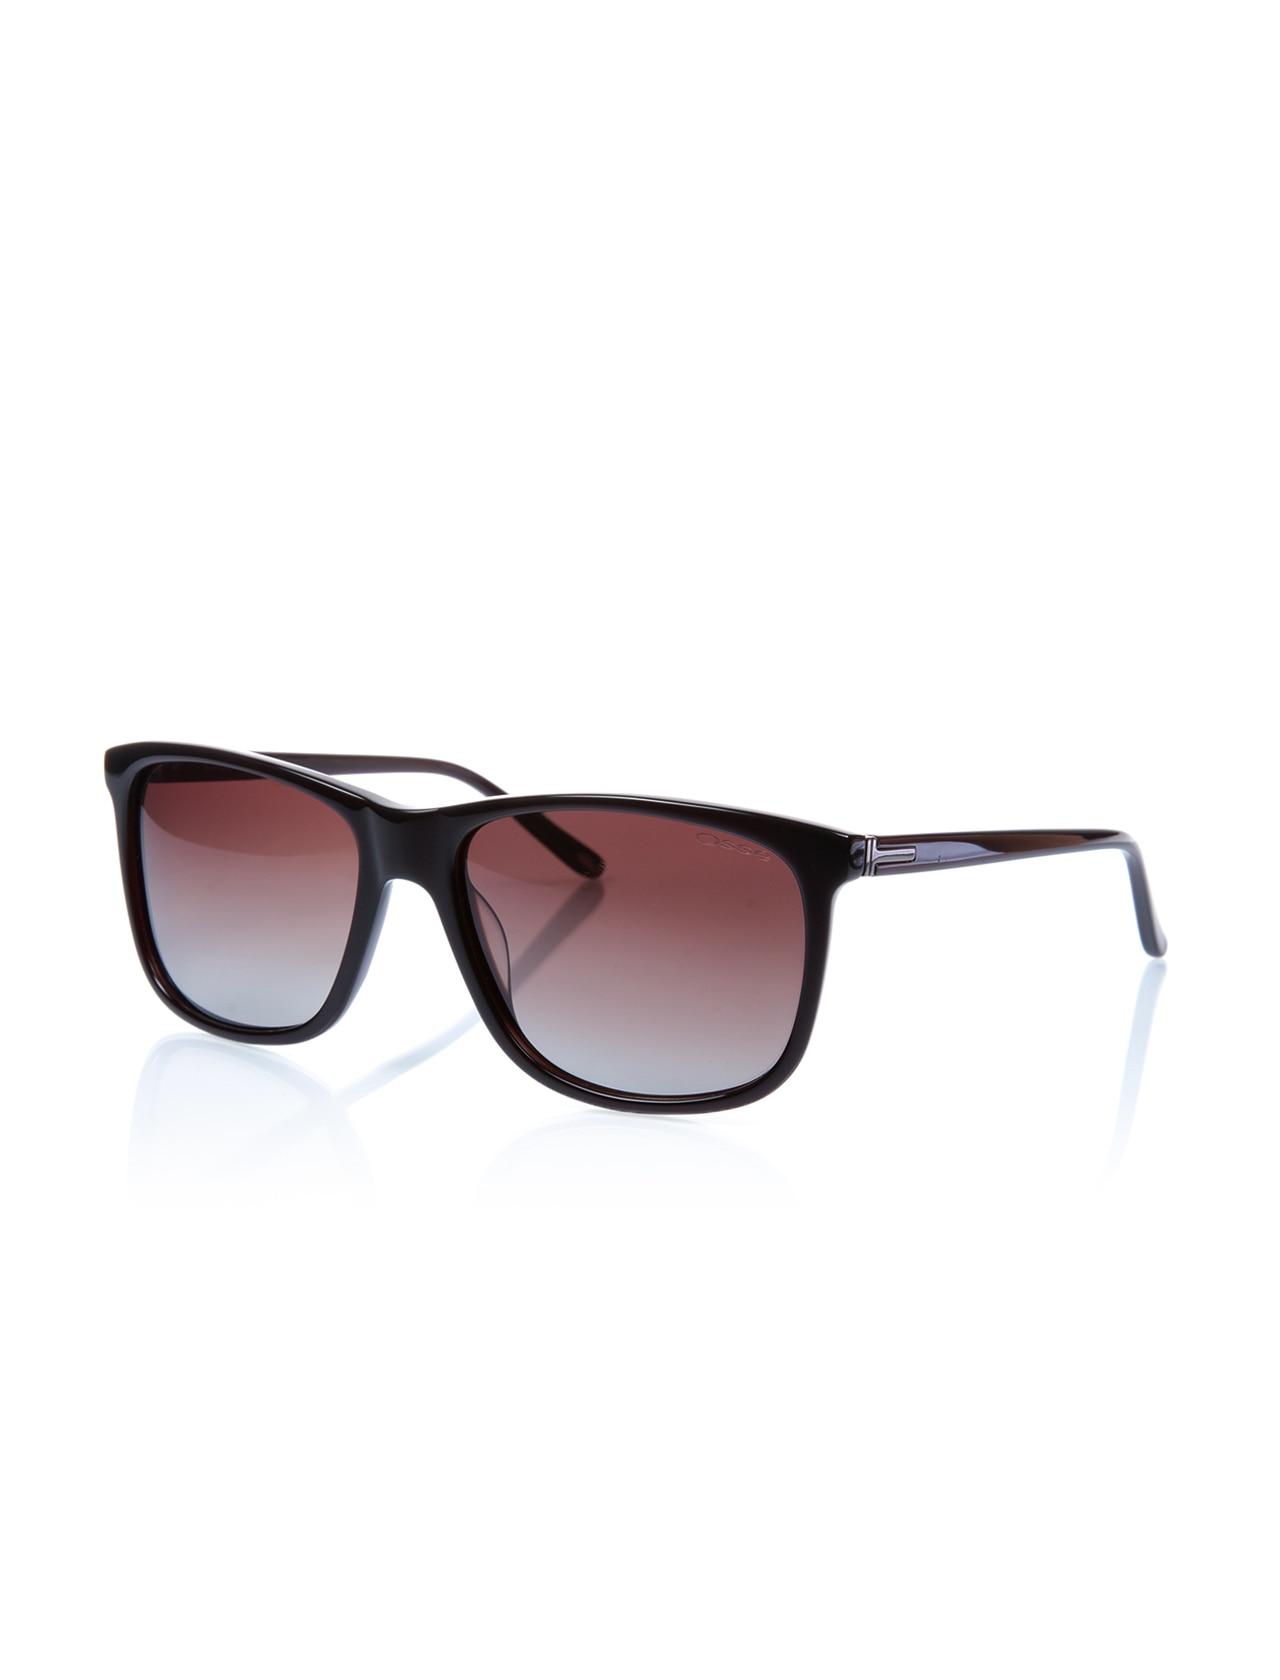 Men's sunglasses os 2429 03 bone Brown organic square square 57-17-140 osse